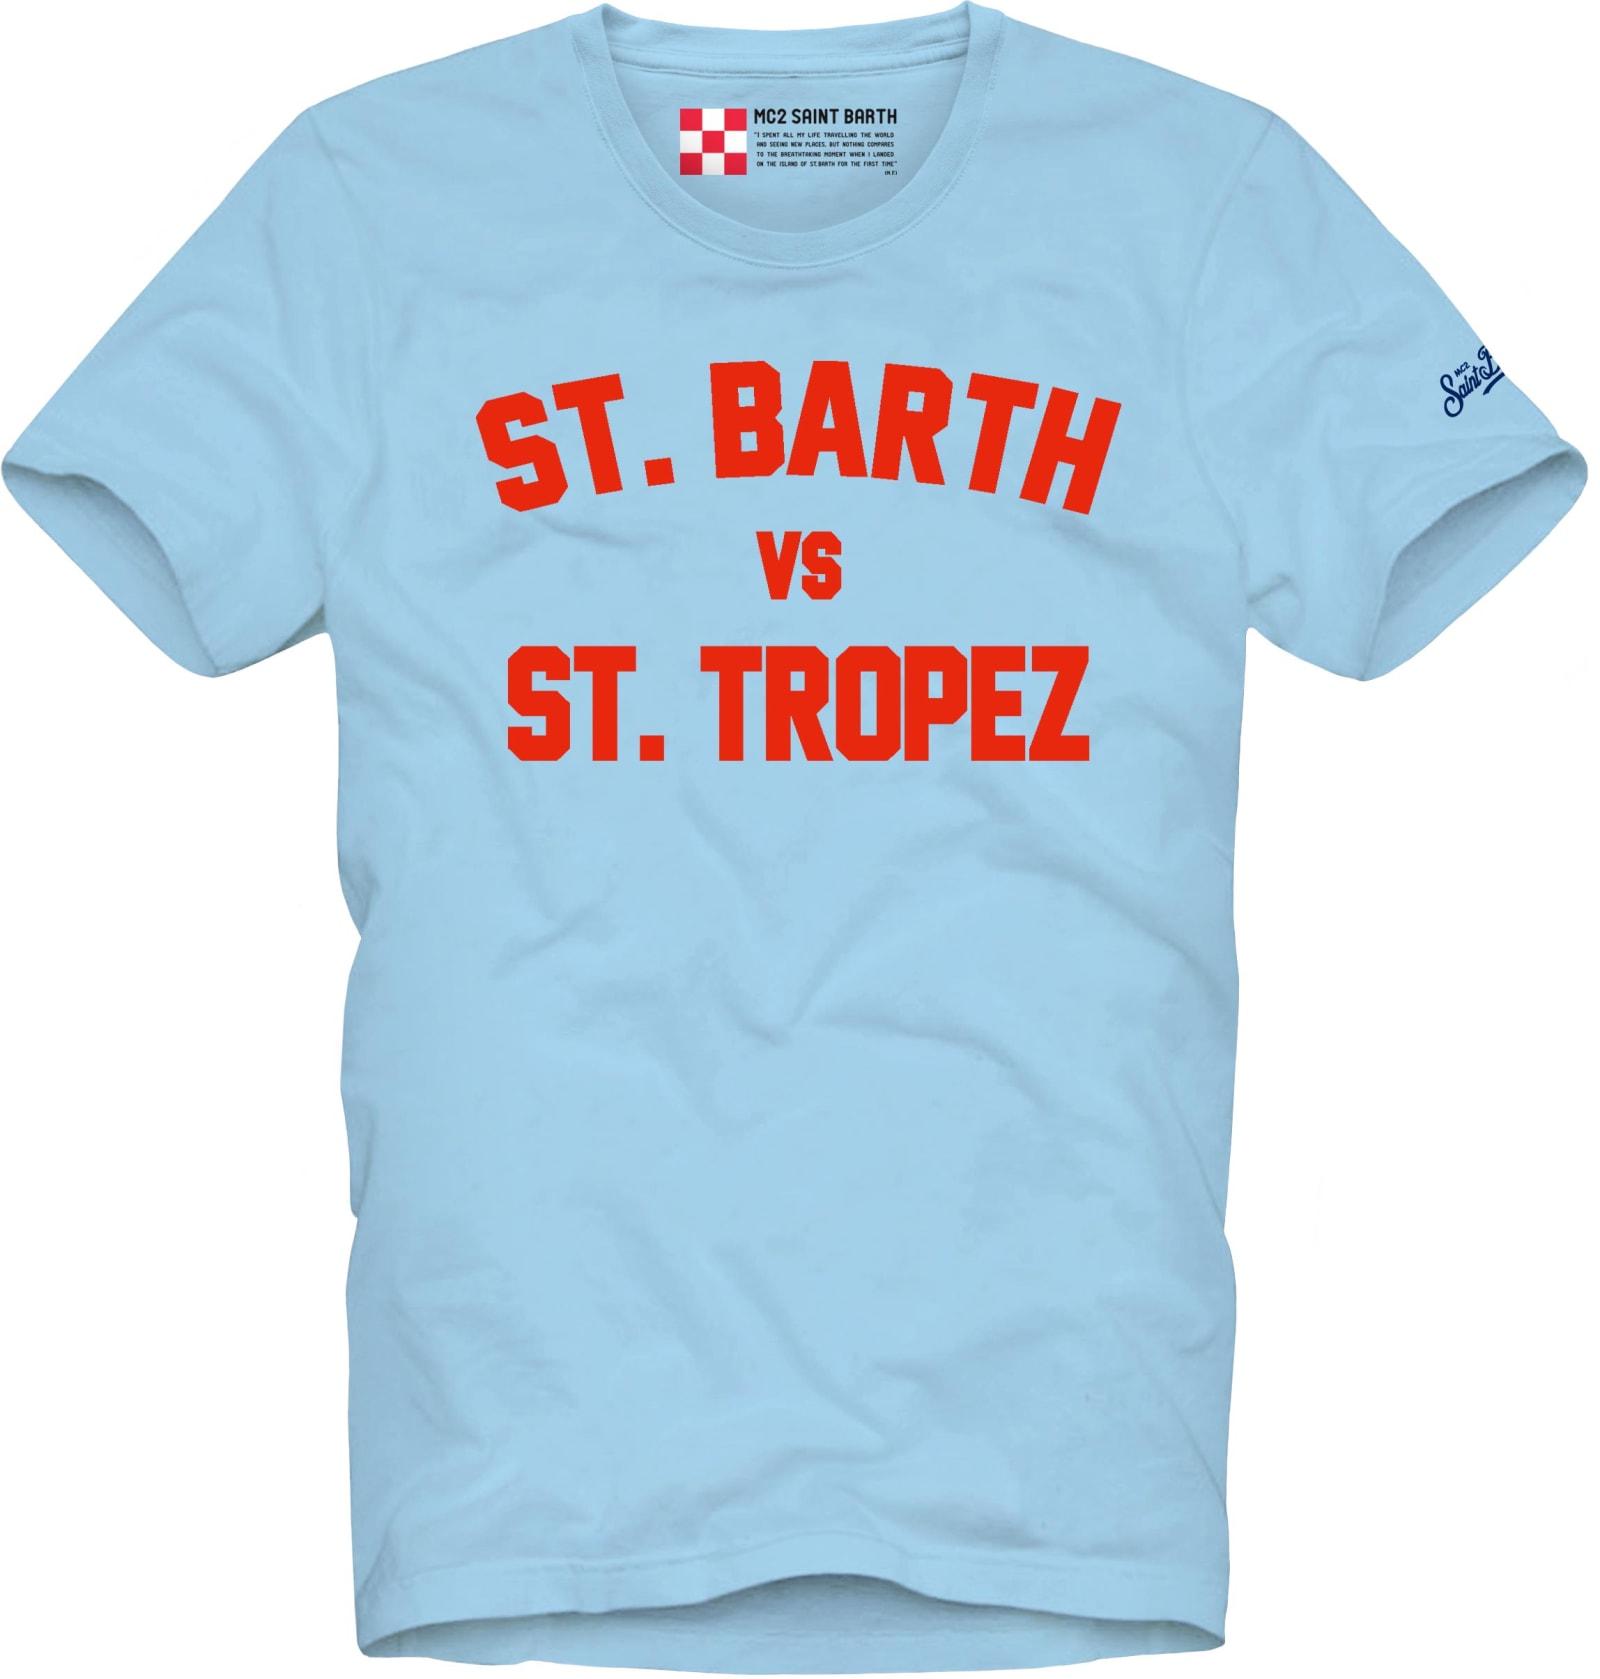 St Barth Vs St Tropez Printed Man T-shirt